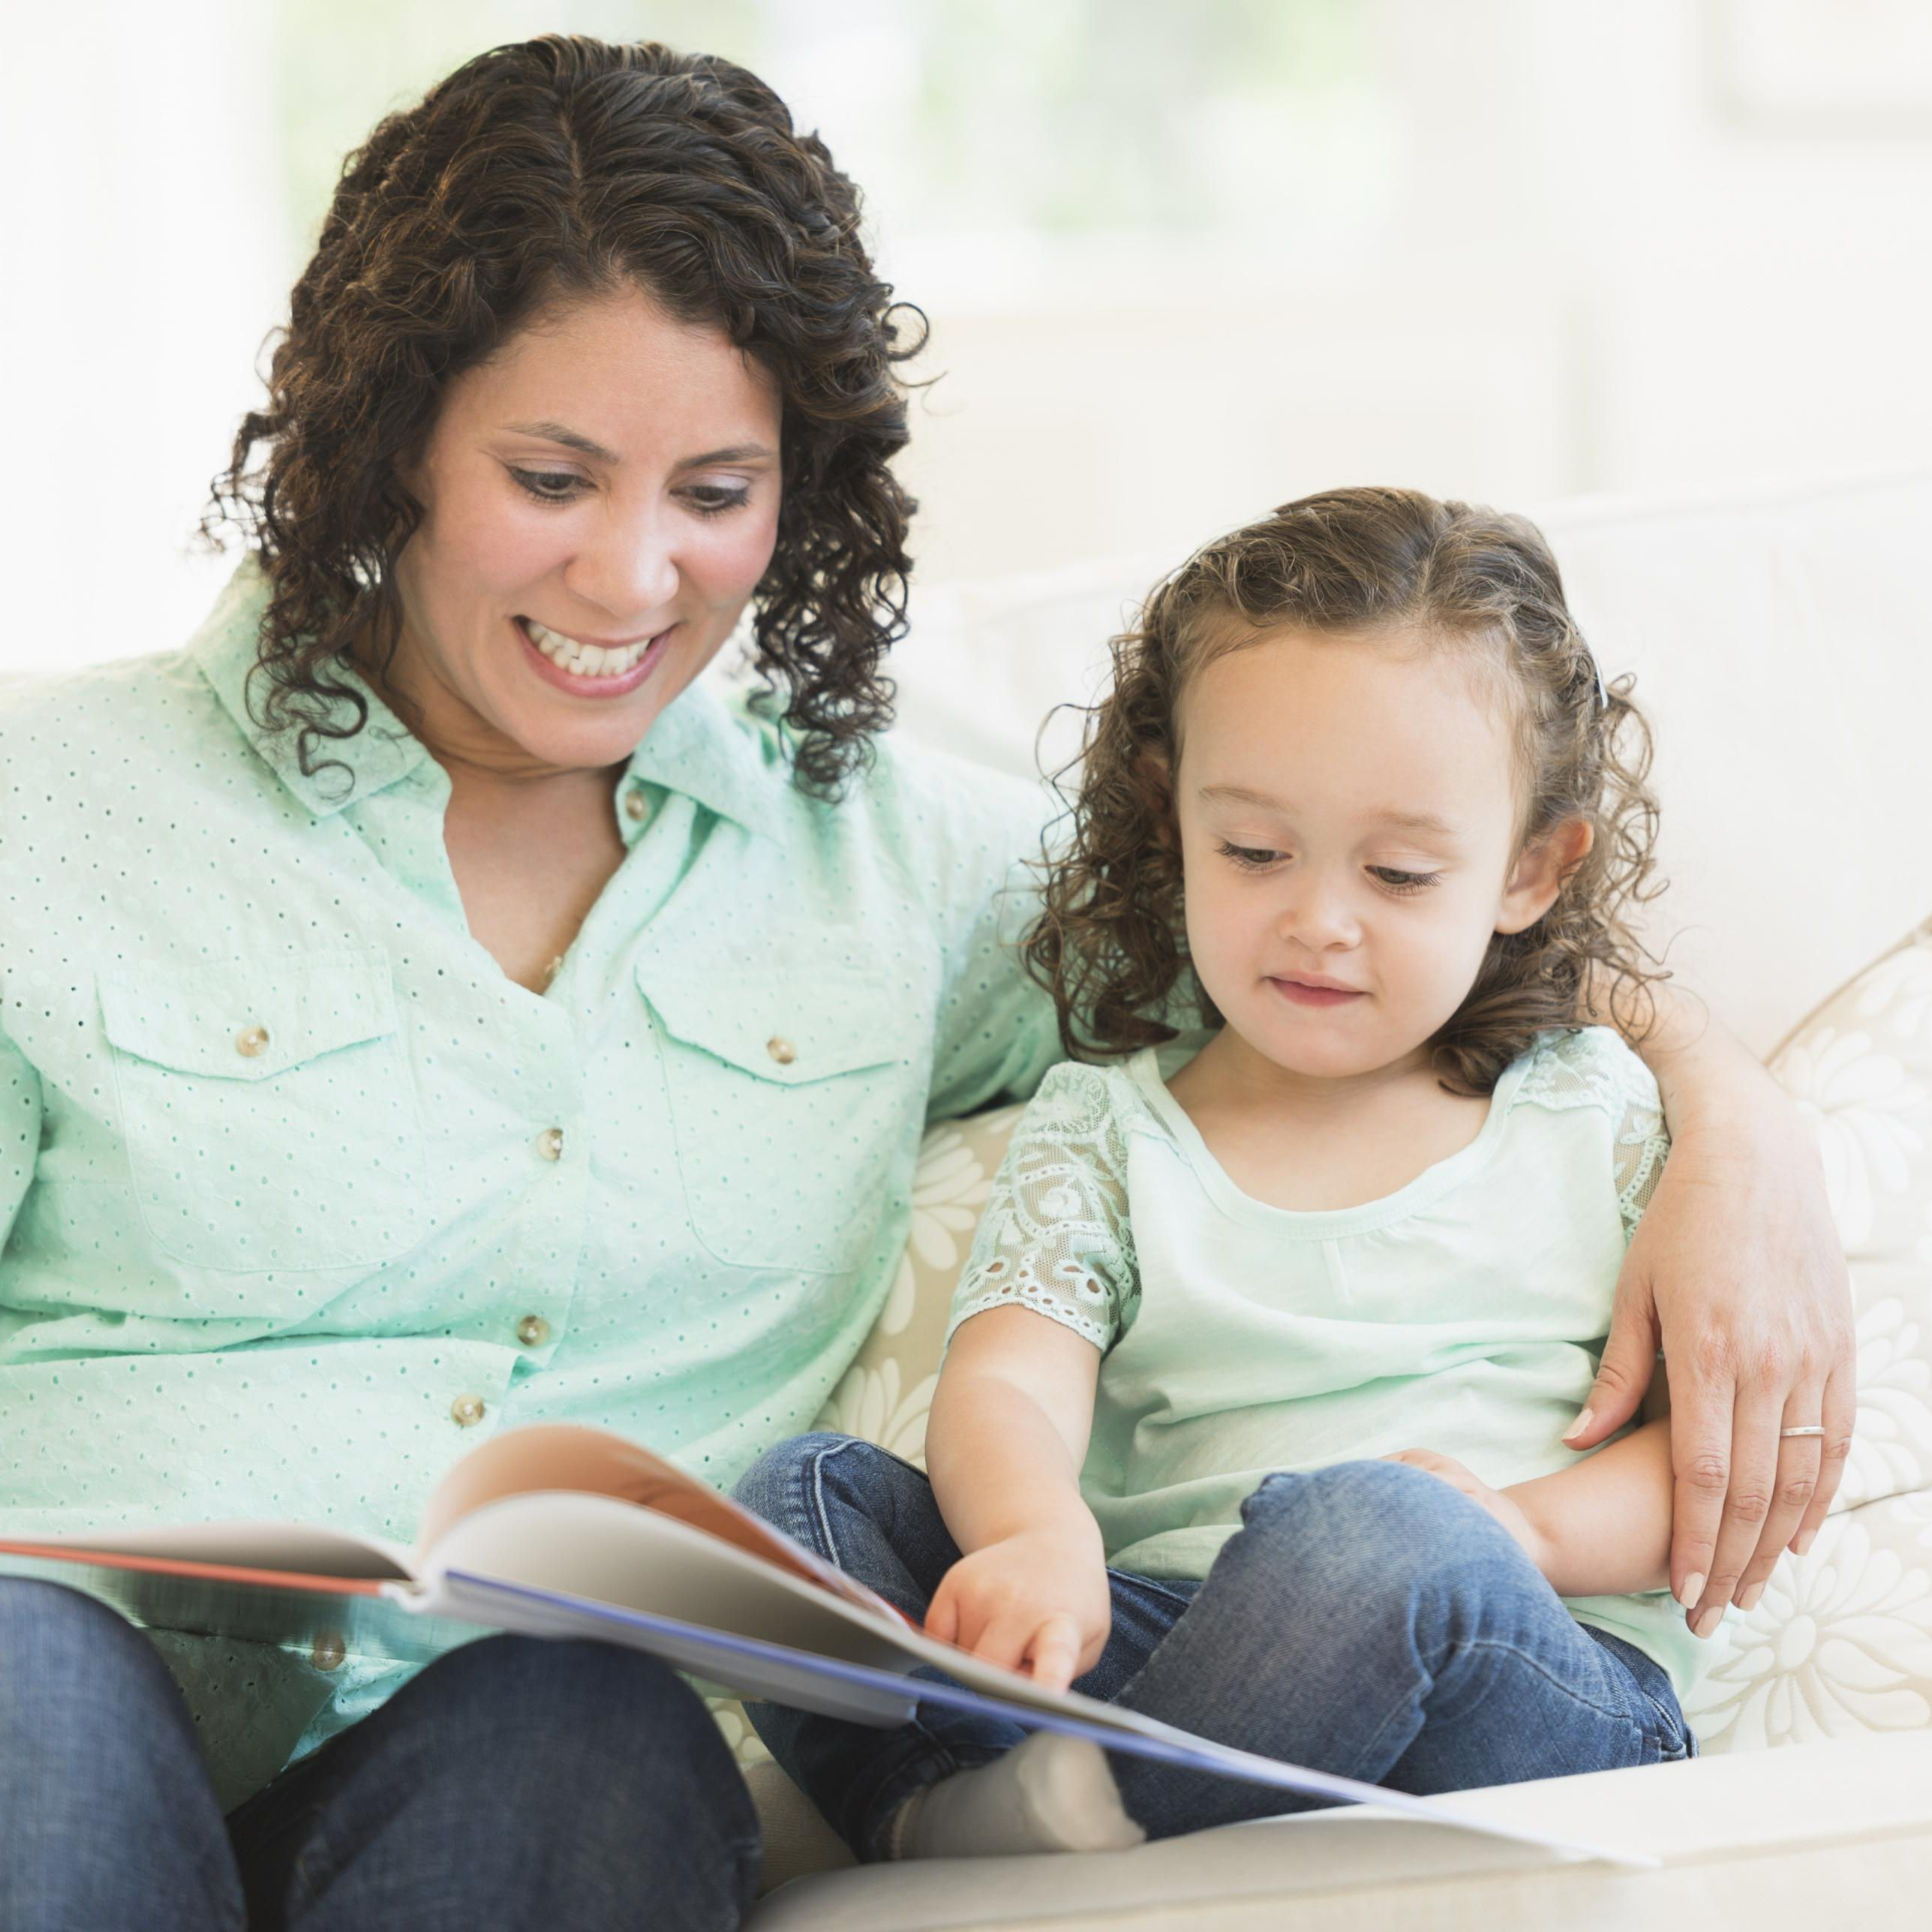 8 Fun Ways to Build a Child's Vocabulary